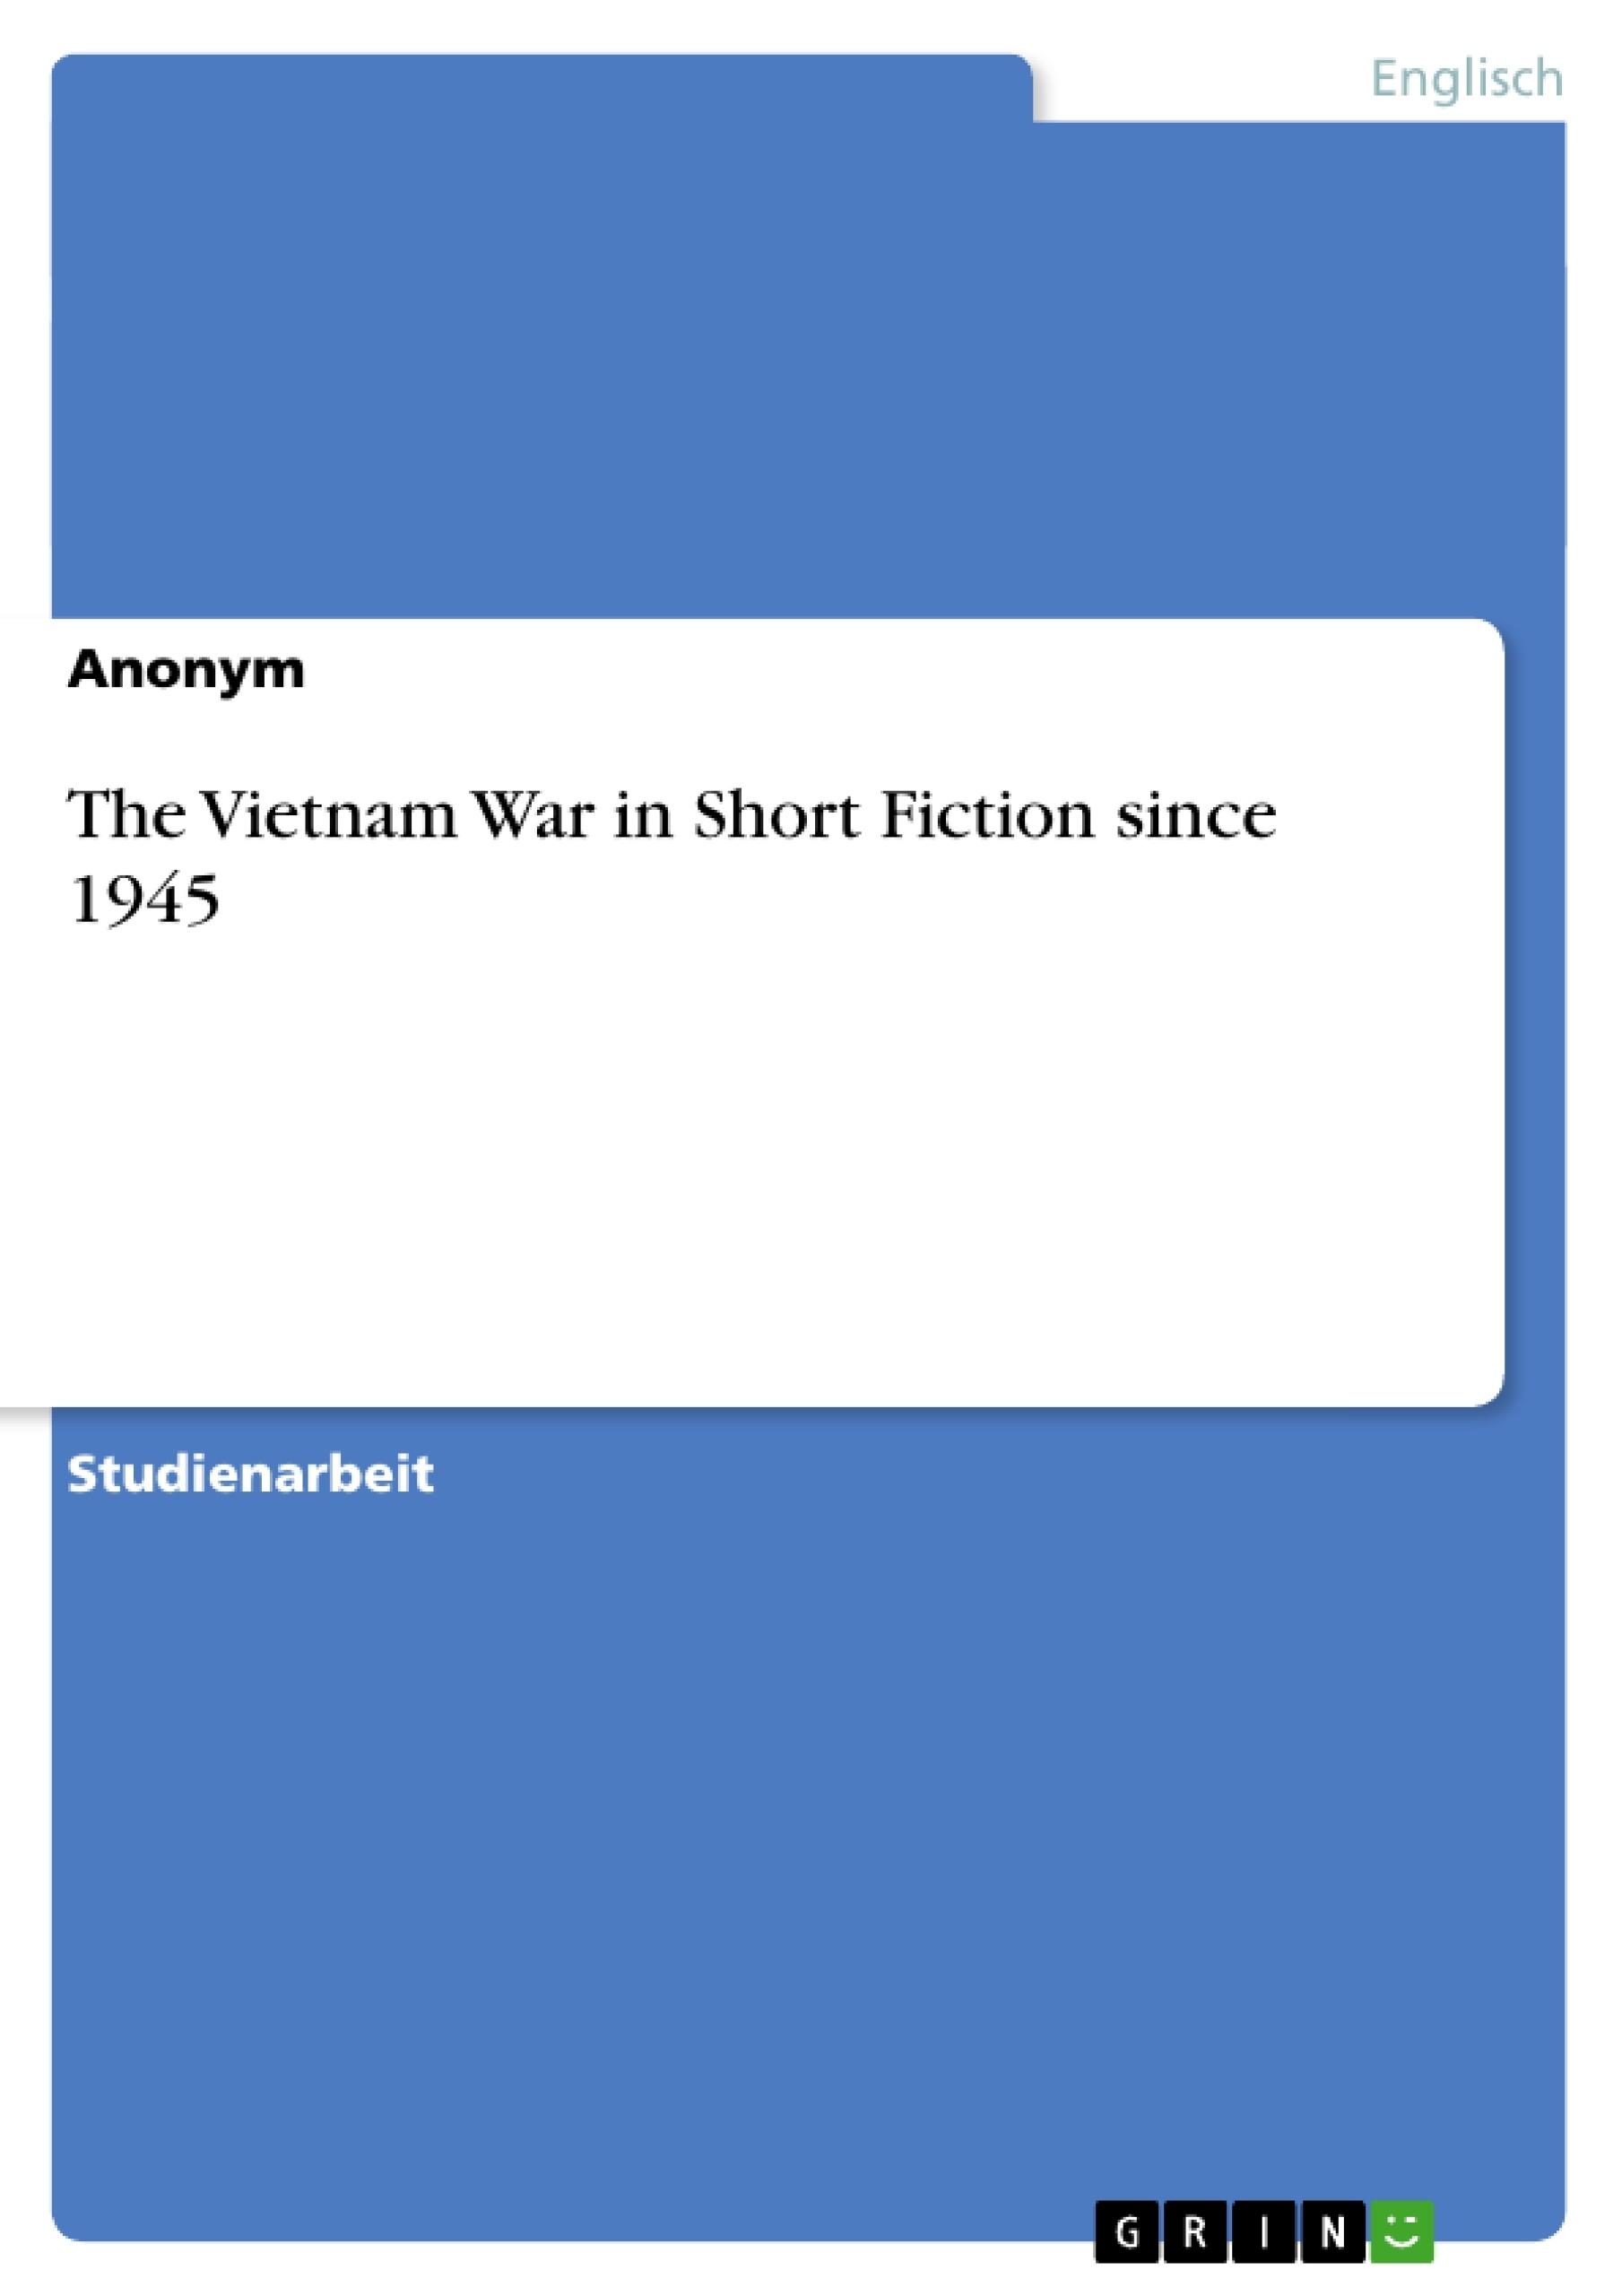 Titel: The Vietnam War in Short Fiction since 1945